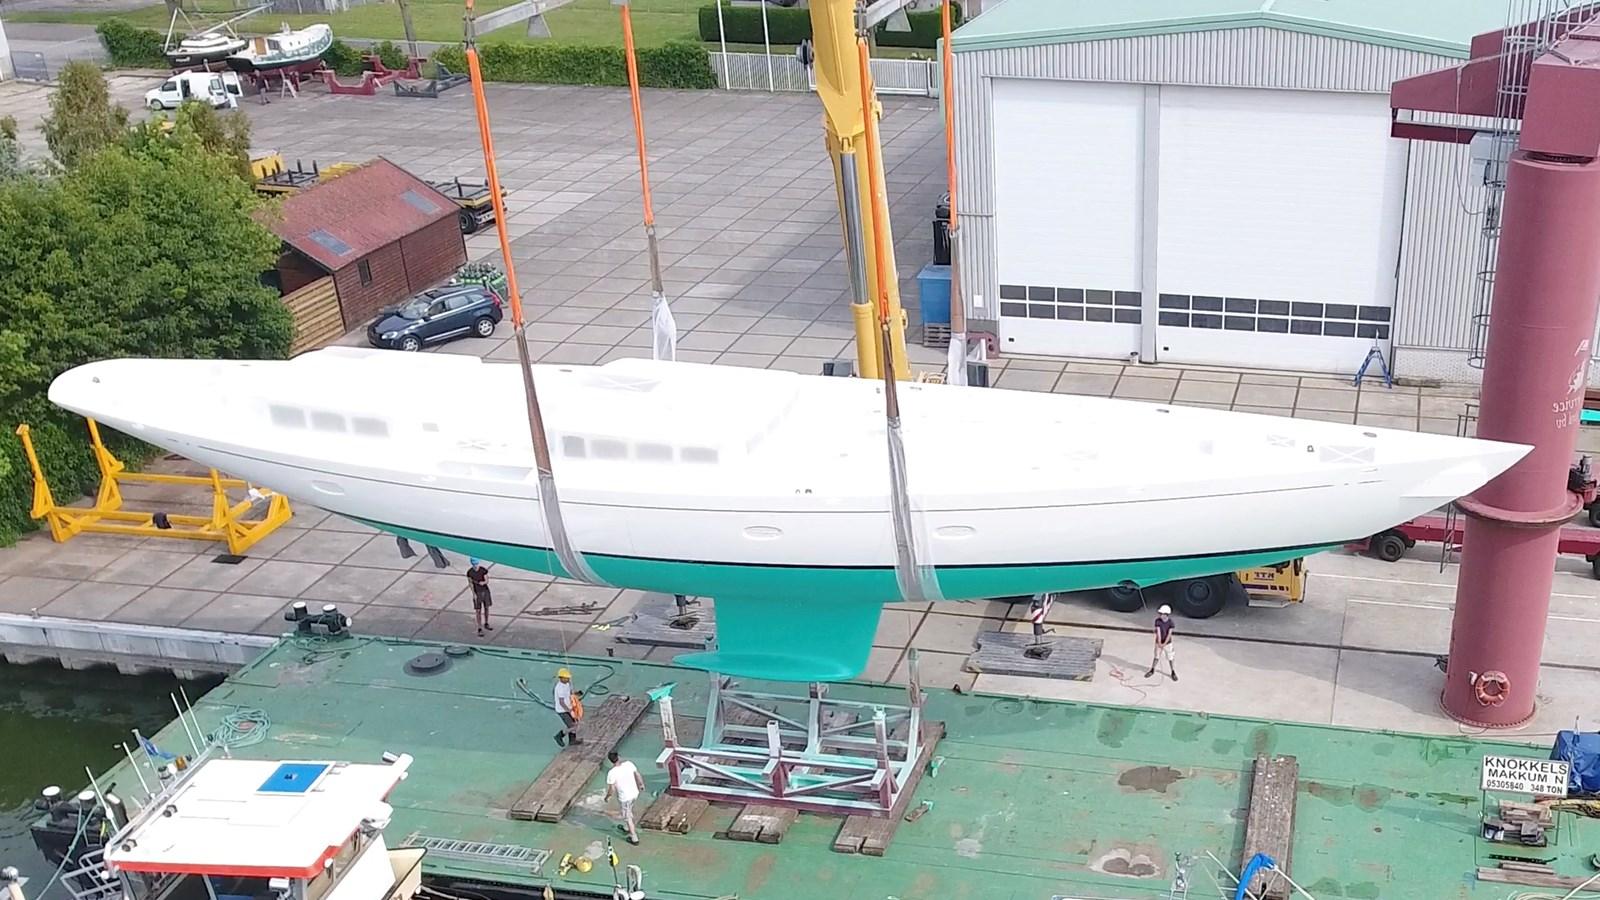 TC 90 Hull # 4 Hull plaatje 2020 #1 HULL Truly Classic Classic Yacht 2887077